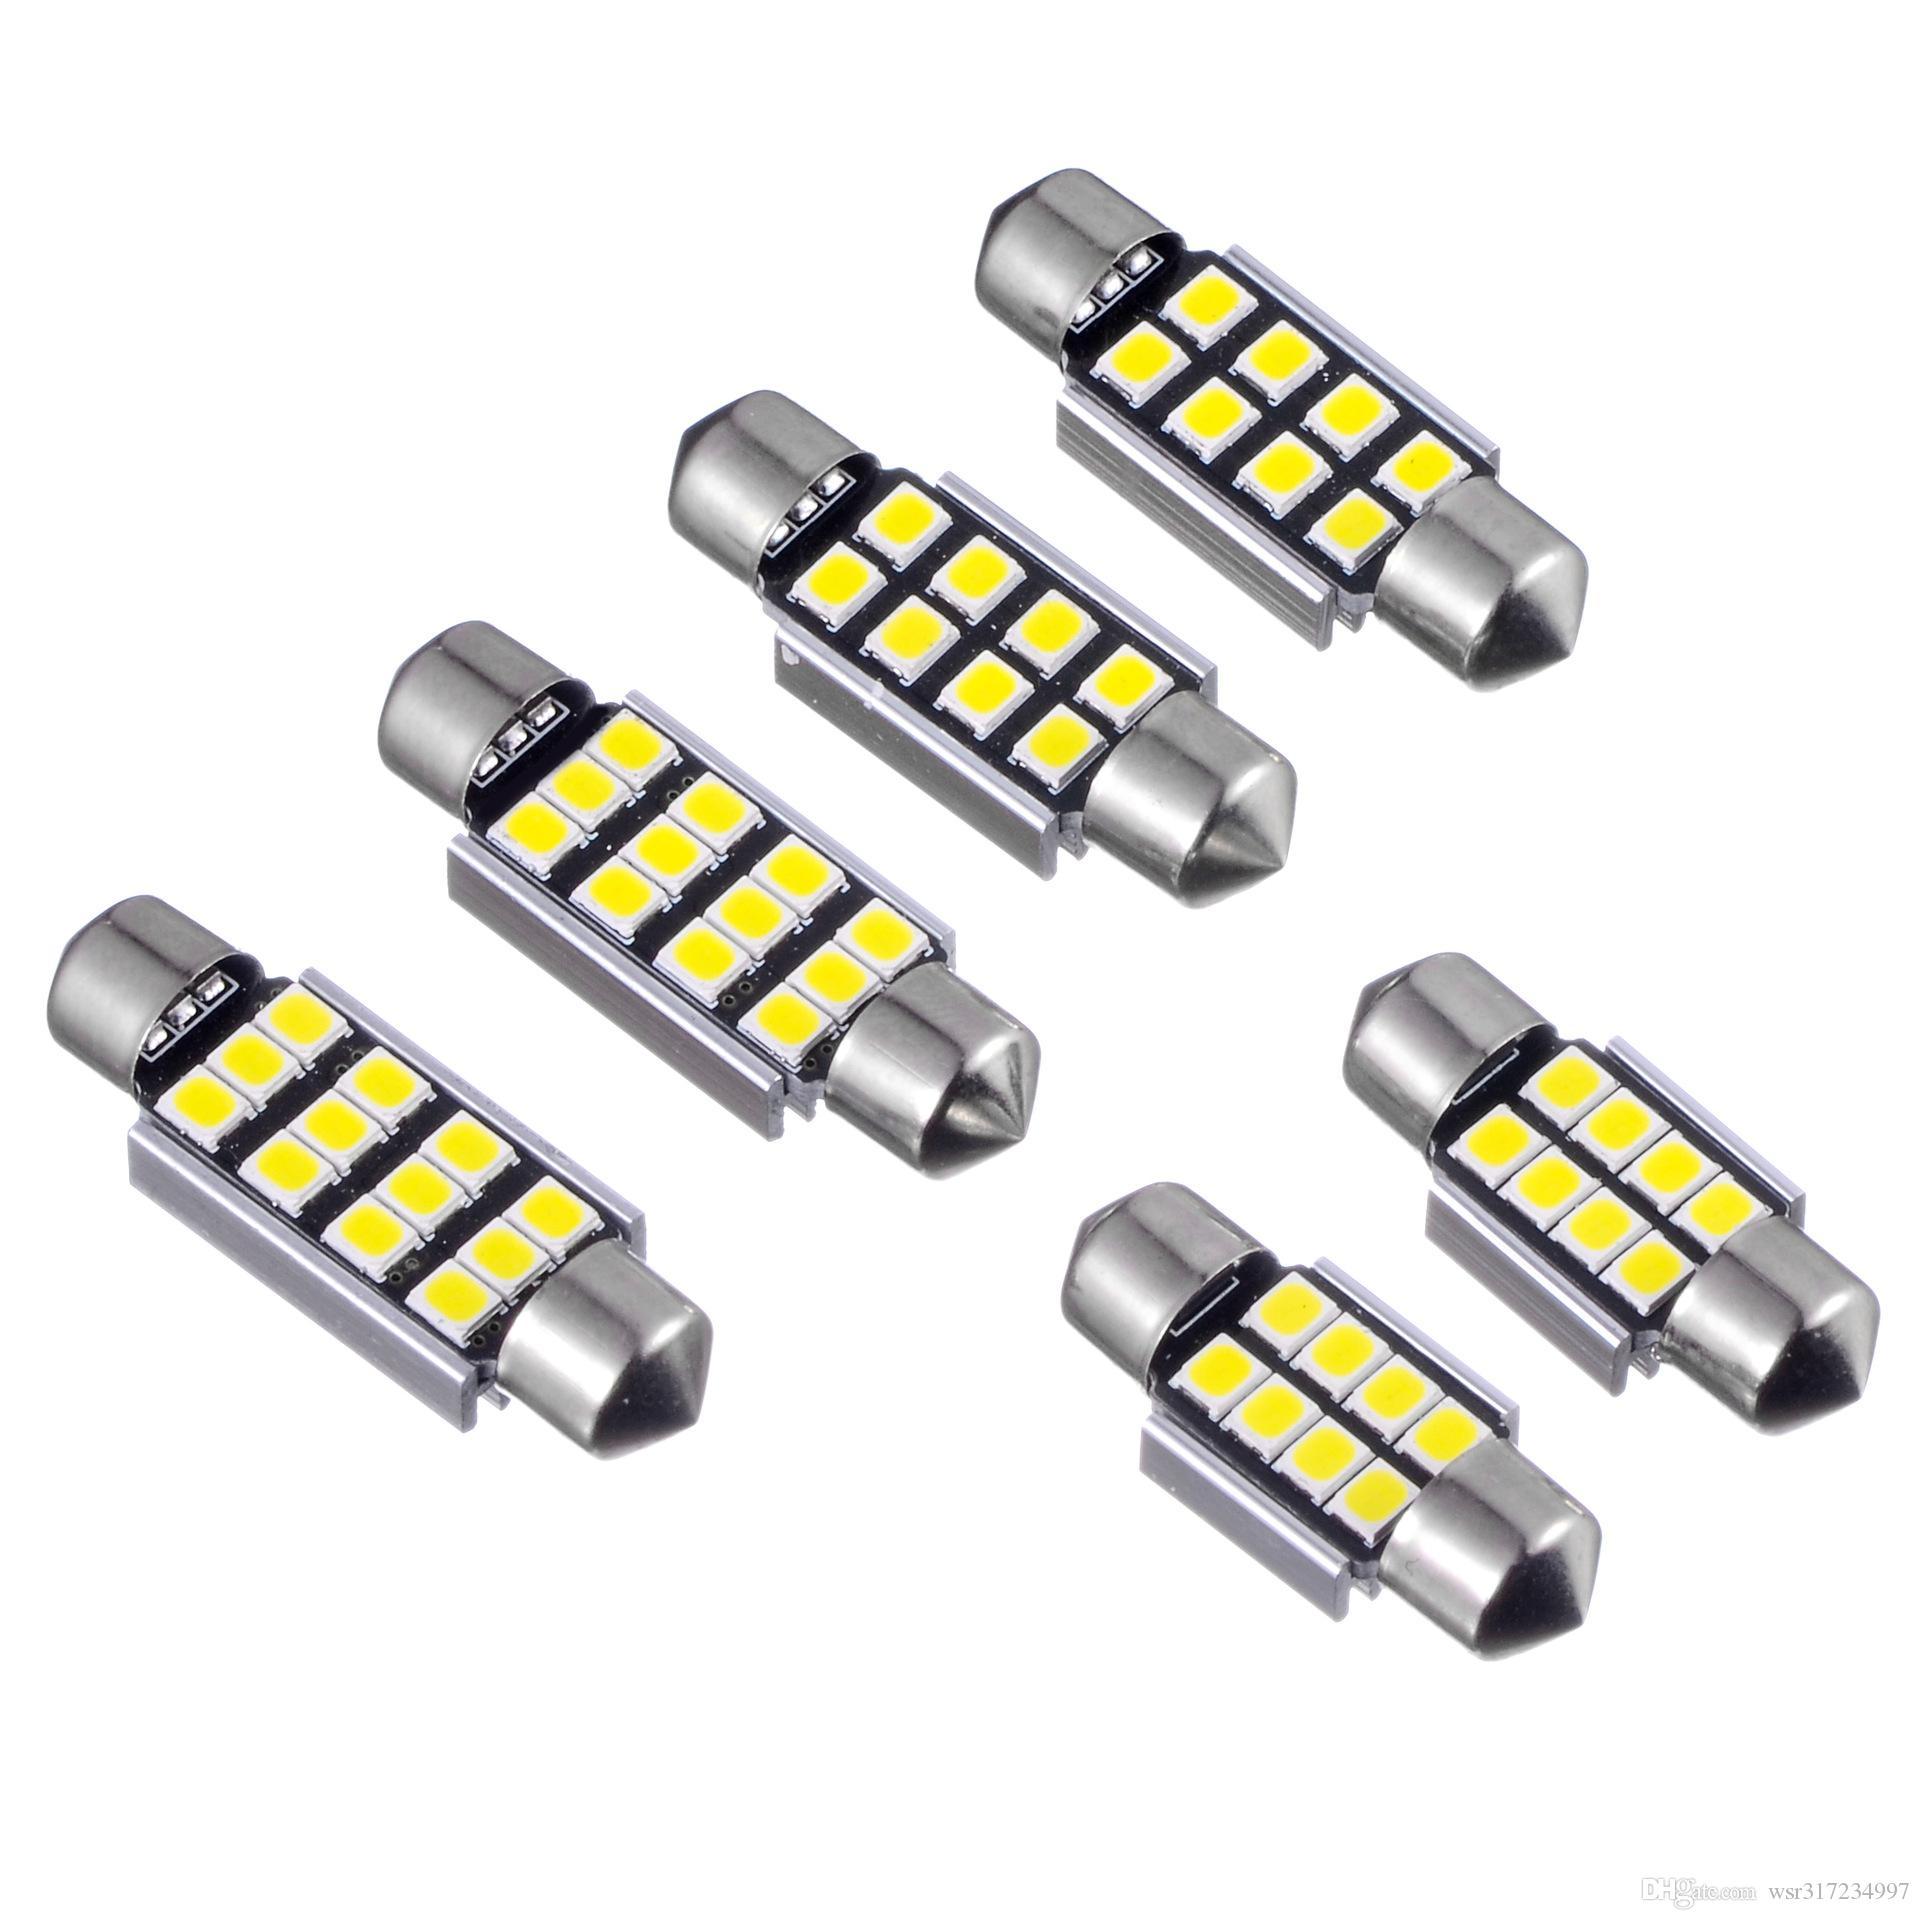 YENI LED İç Harita Işık Festoon 36mm 31mm 39mm 41mm 2835 Hata Ücretsiz 8SMD LED Okuma Işık Araba İç Dome lamba Ampüller